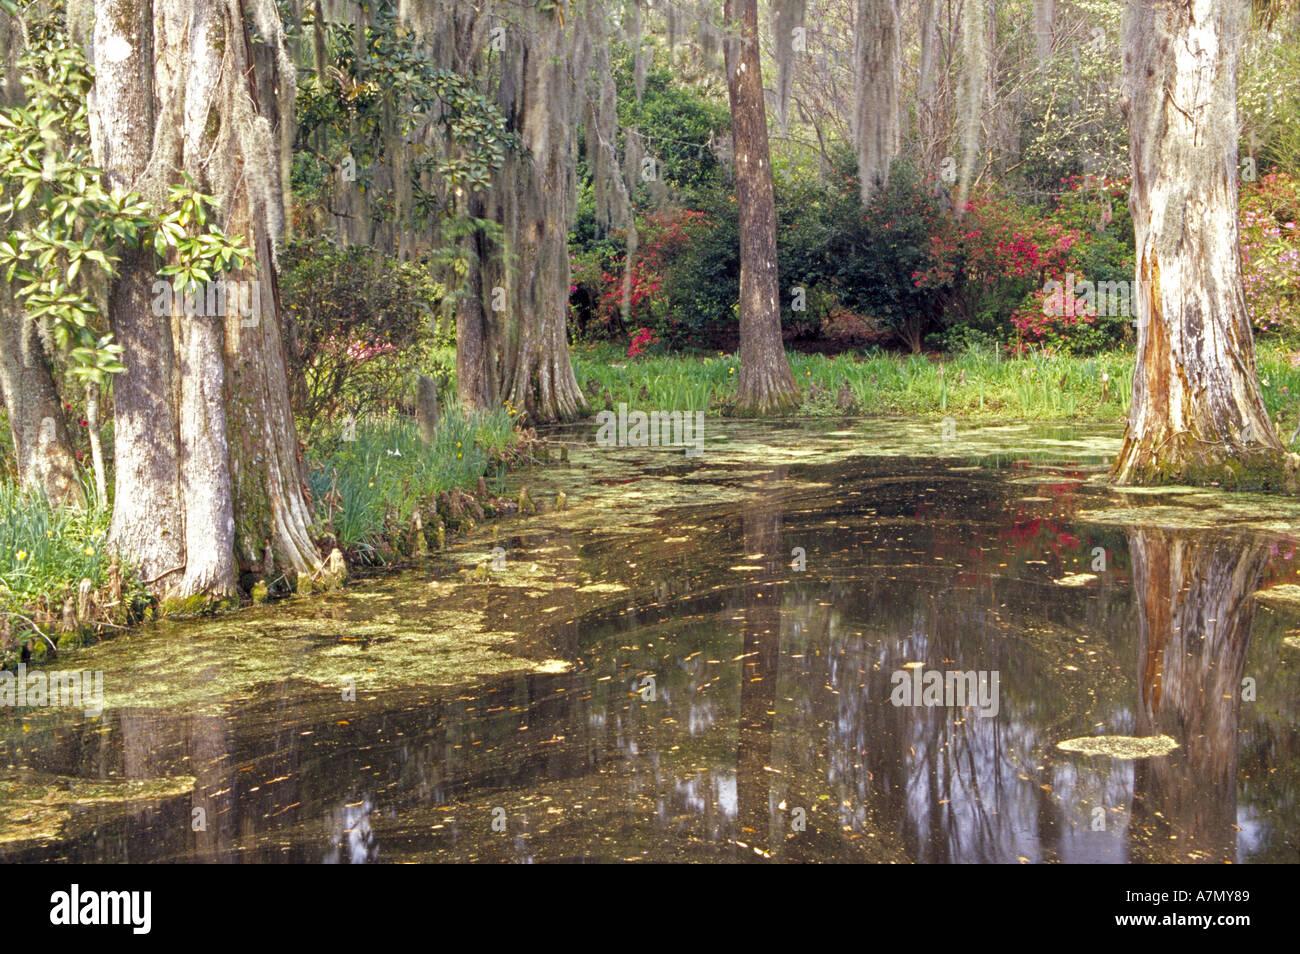 Cypress Gardens South Carolina Stock Photos & Cypress Gardens South ...